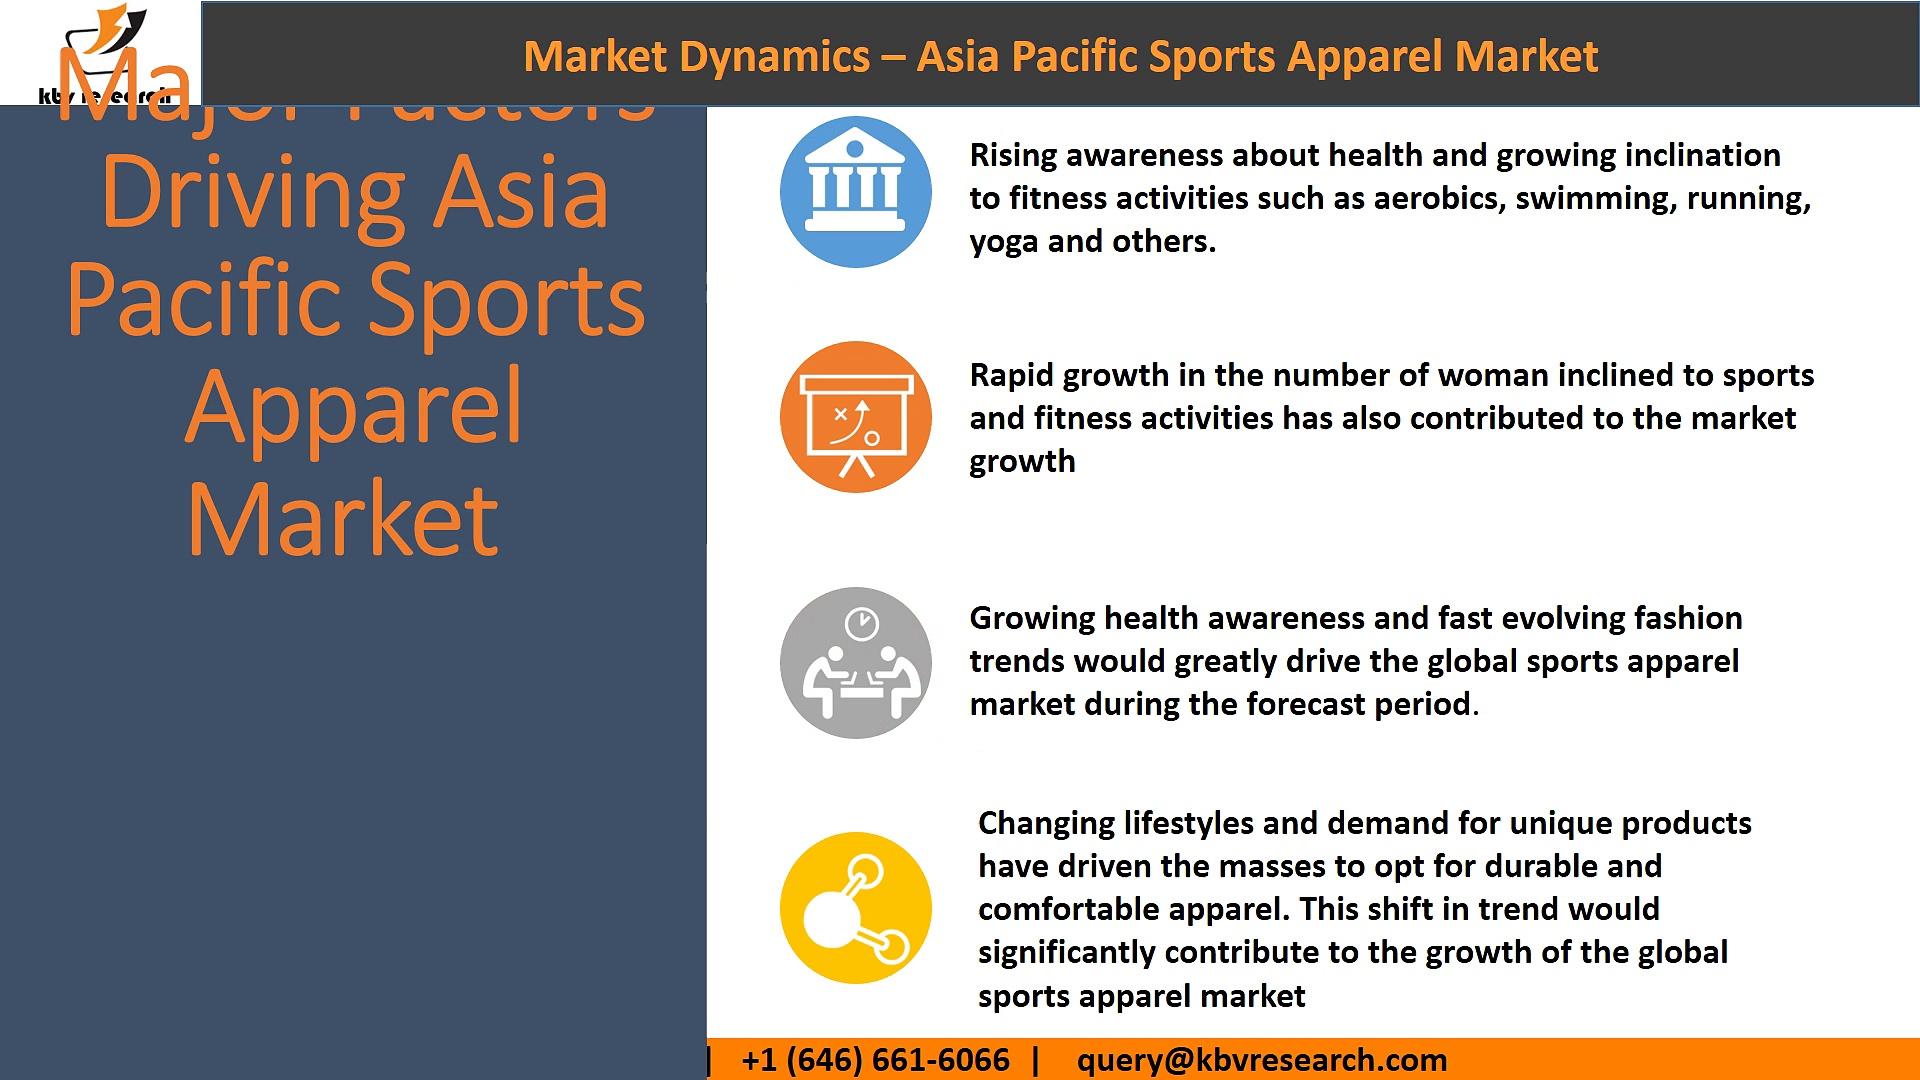 Asia Pacific Sports Apparel Market